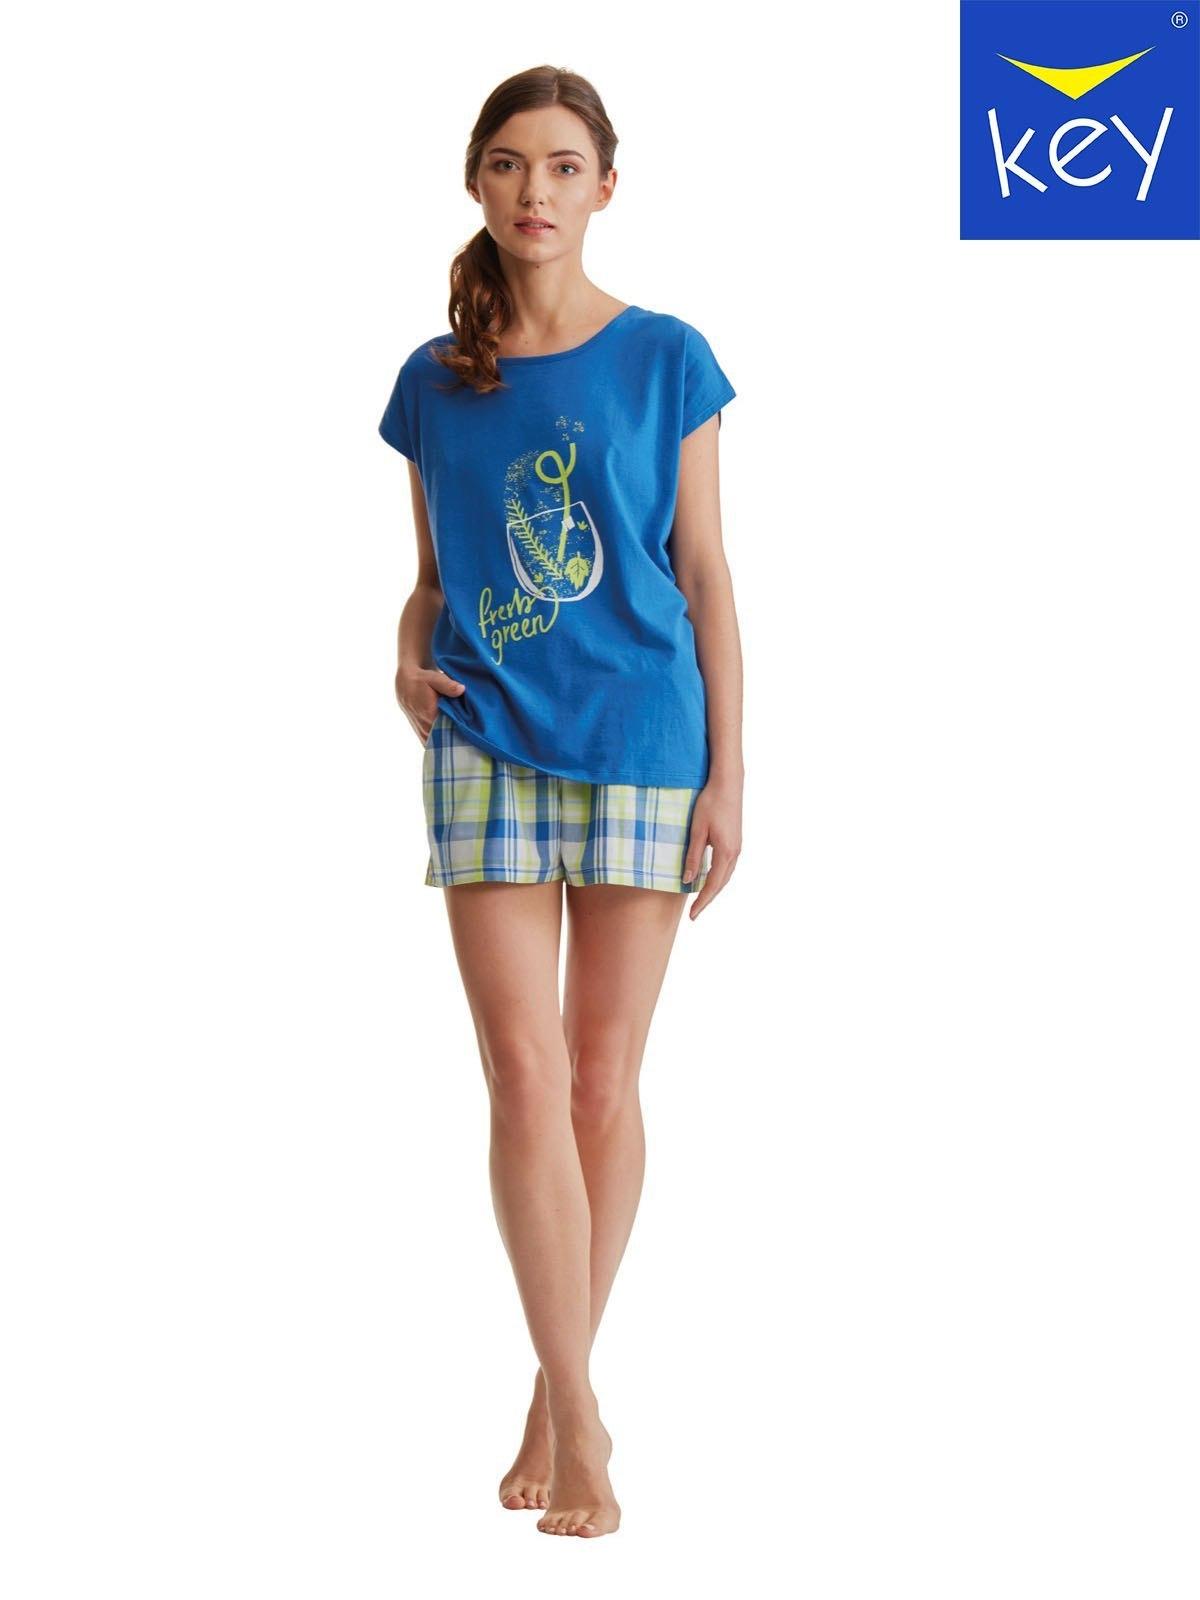 48fbb045fa1a73 Bawełniana piżamka damska z krótkimi spodenkami Key LNS 470 A8.